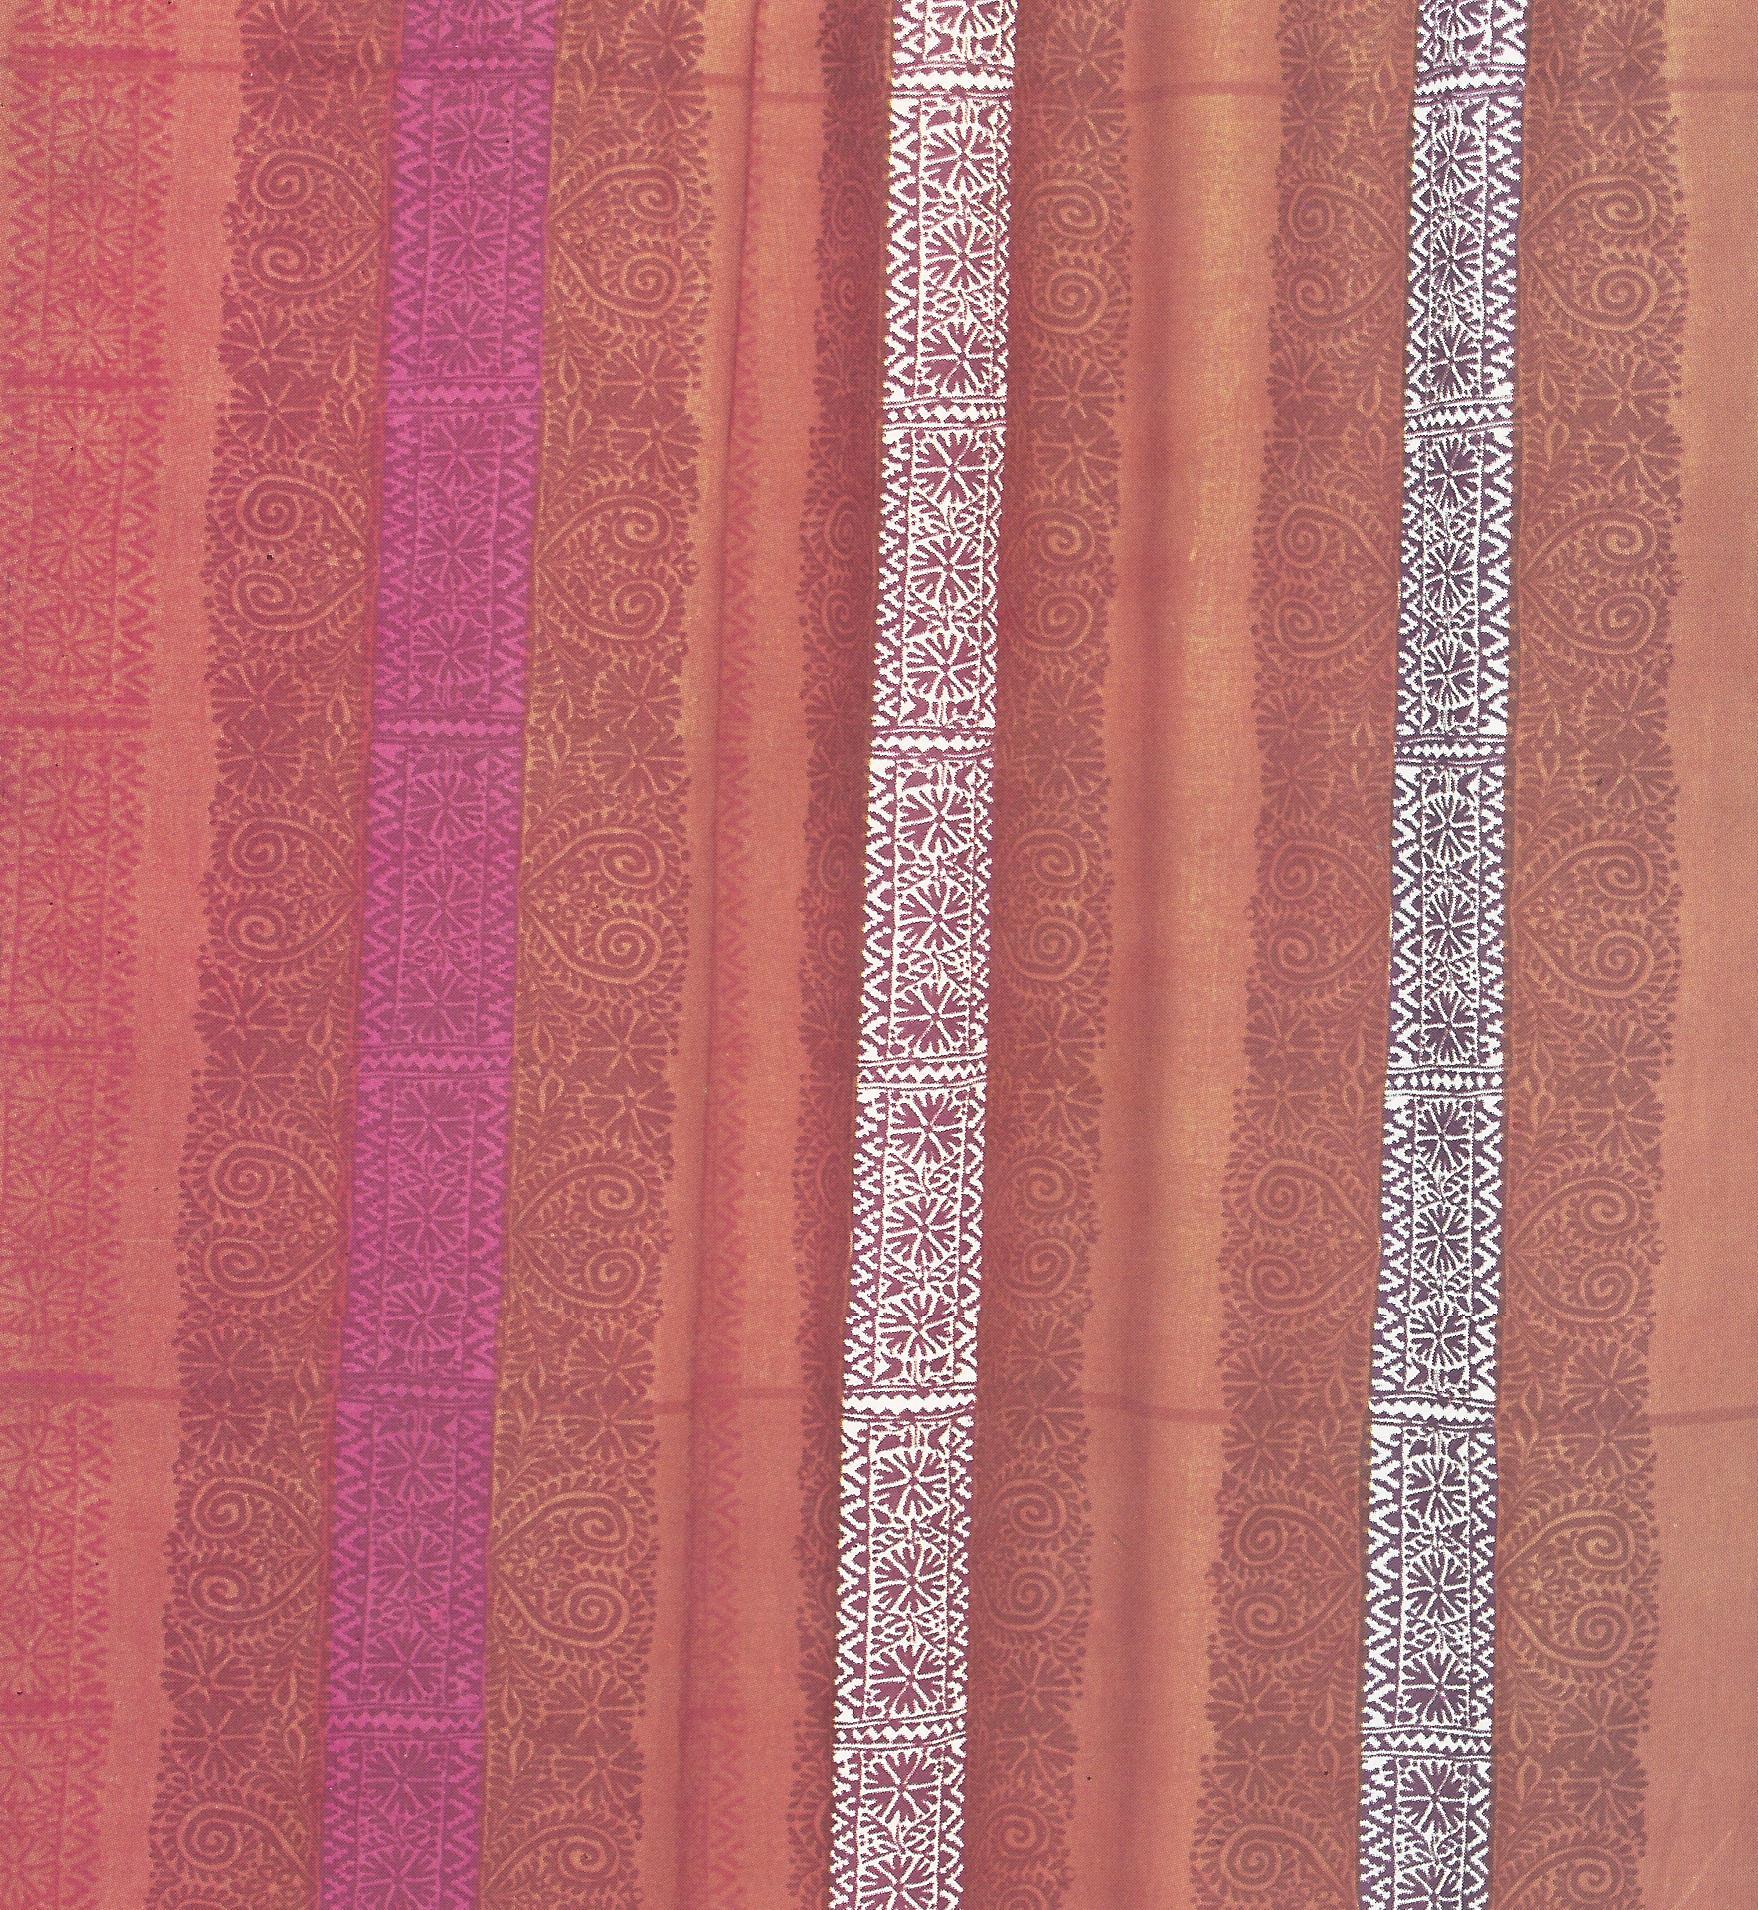 kukkapaa maija isola findland printex fabric 1960